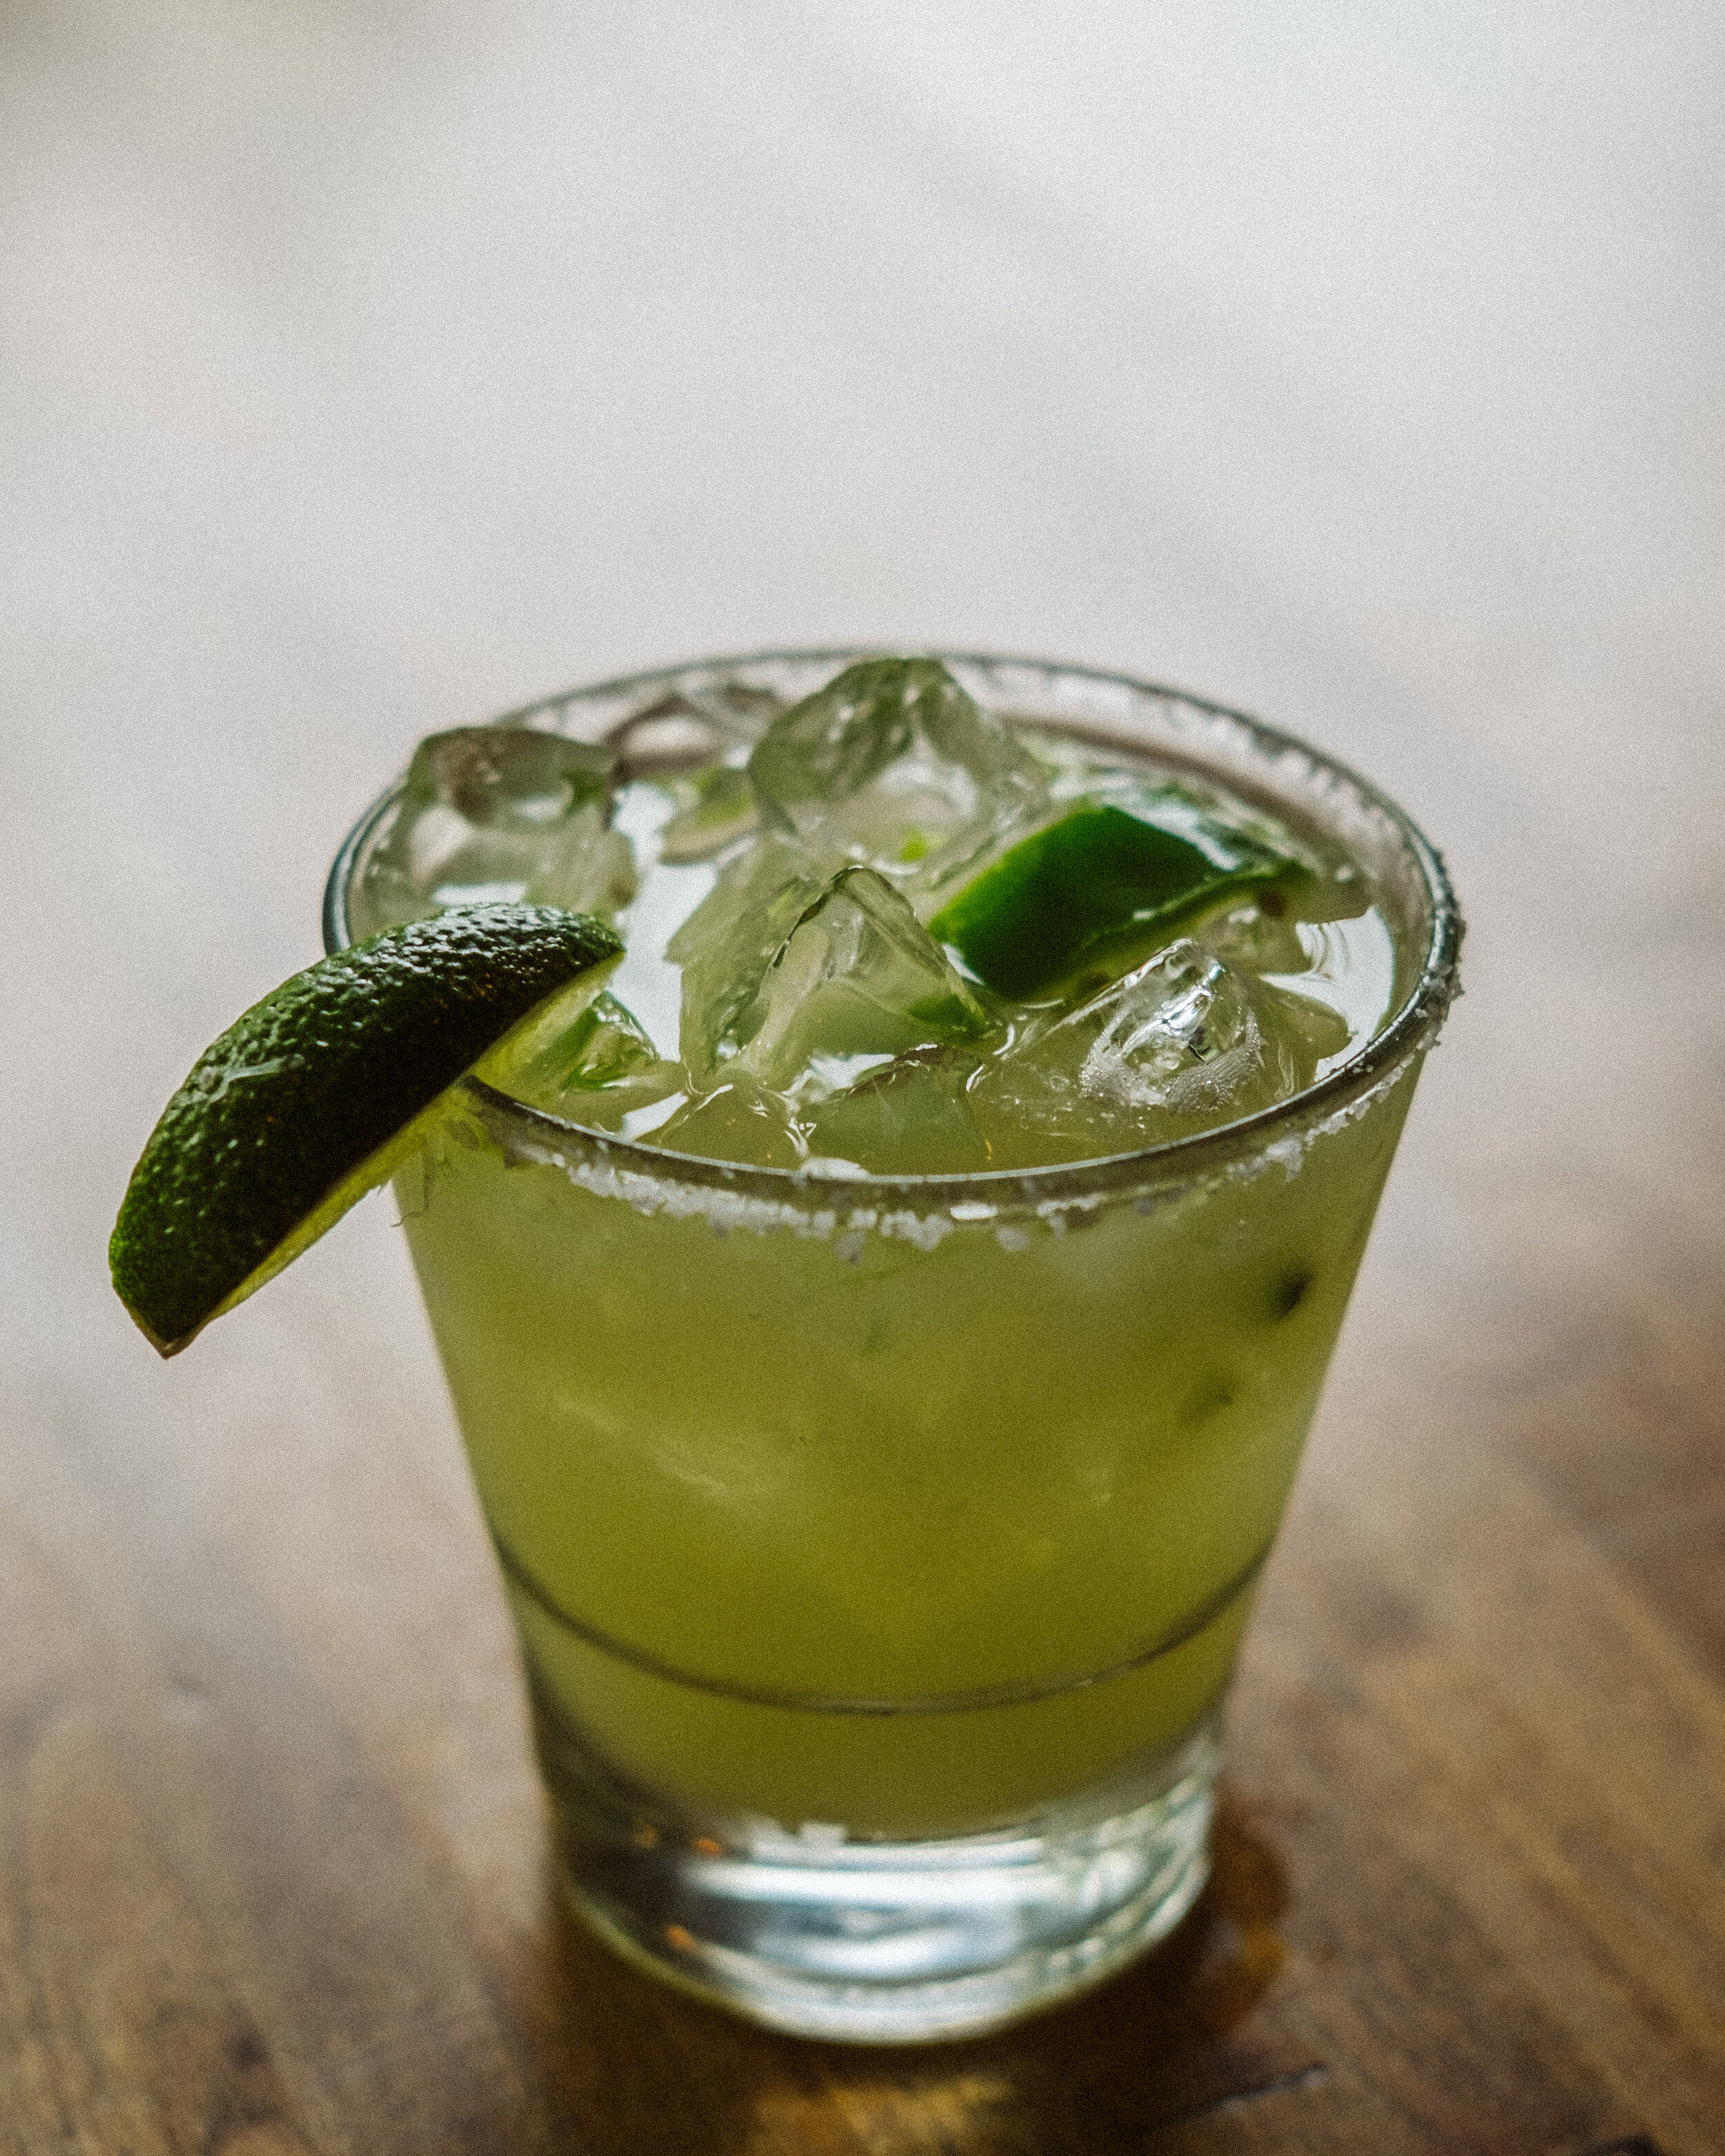 FireChuck Margarita - Cimarron Tequila / Rumhaven Coconut / Lime / Simple / Jalapeno